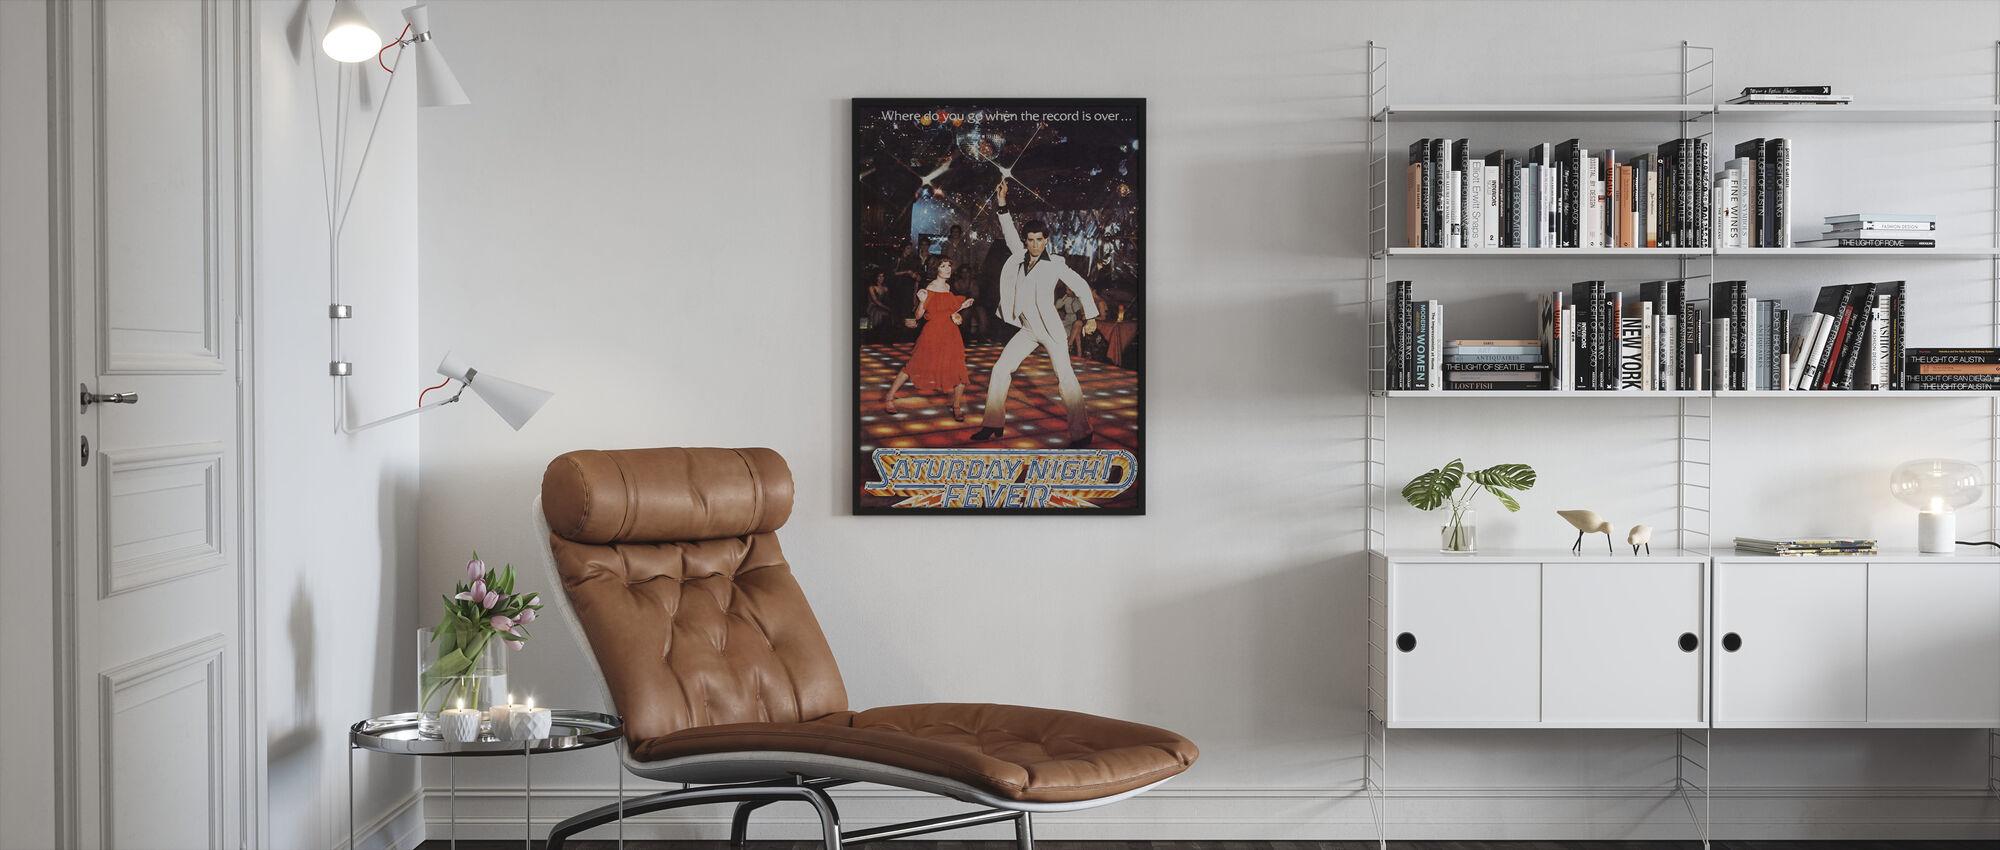 Saturday Night Fever - Framed print - Living Room